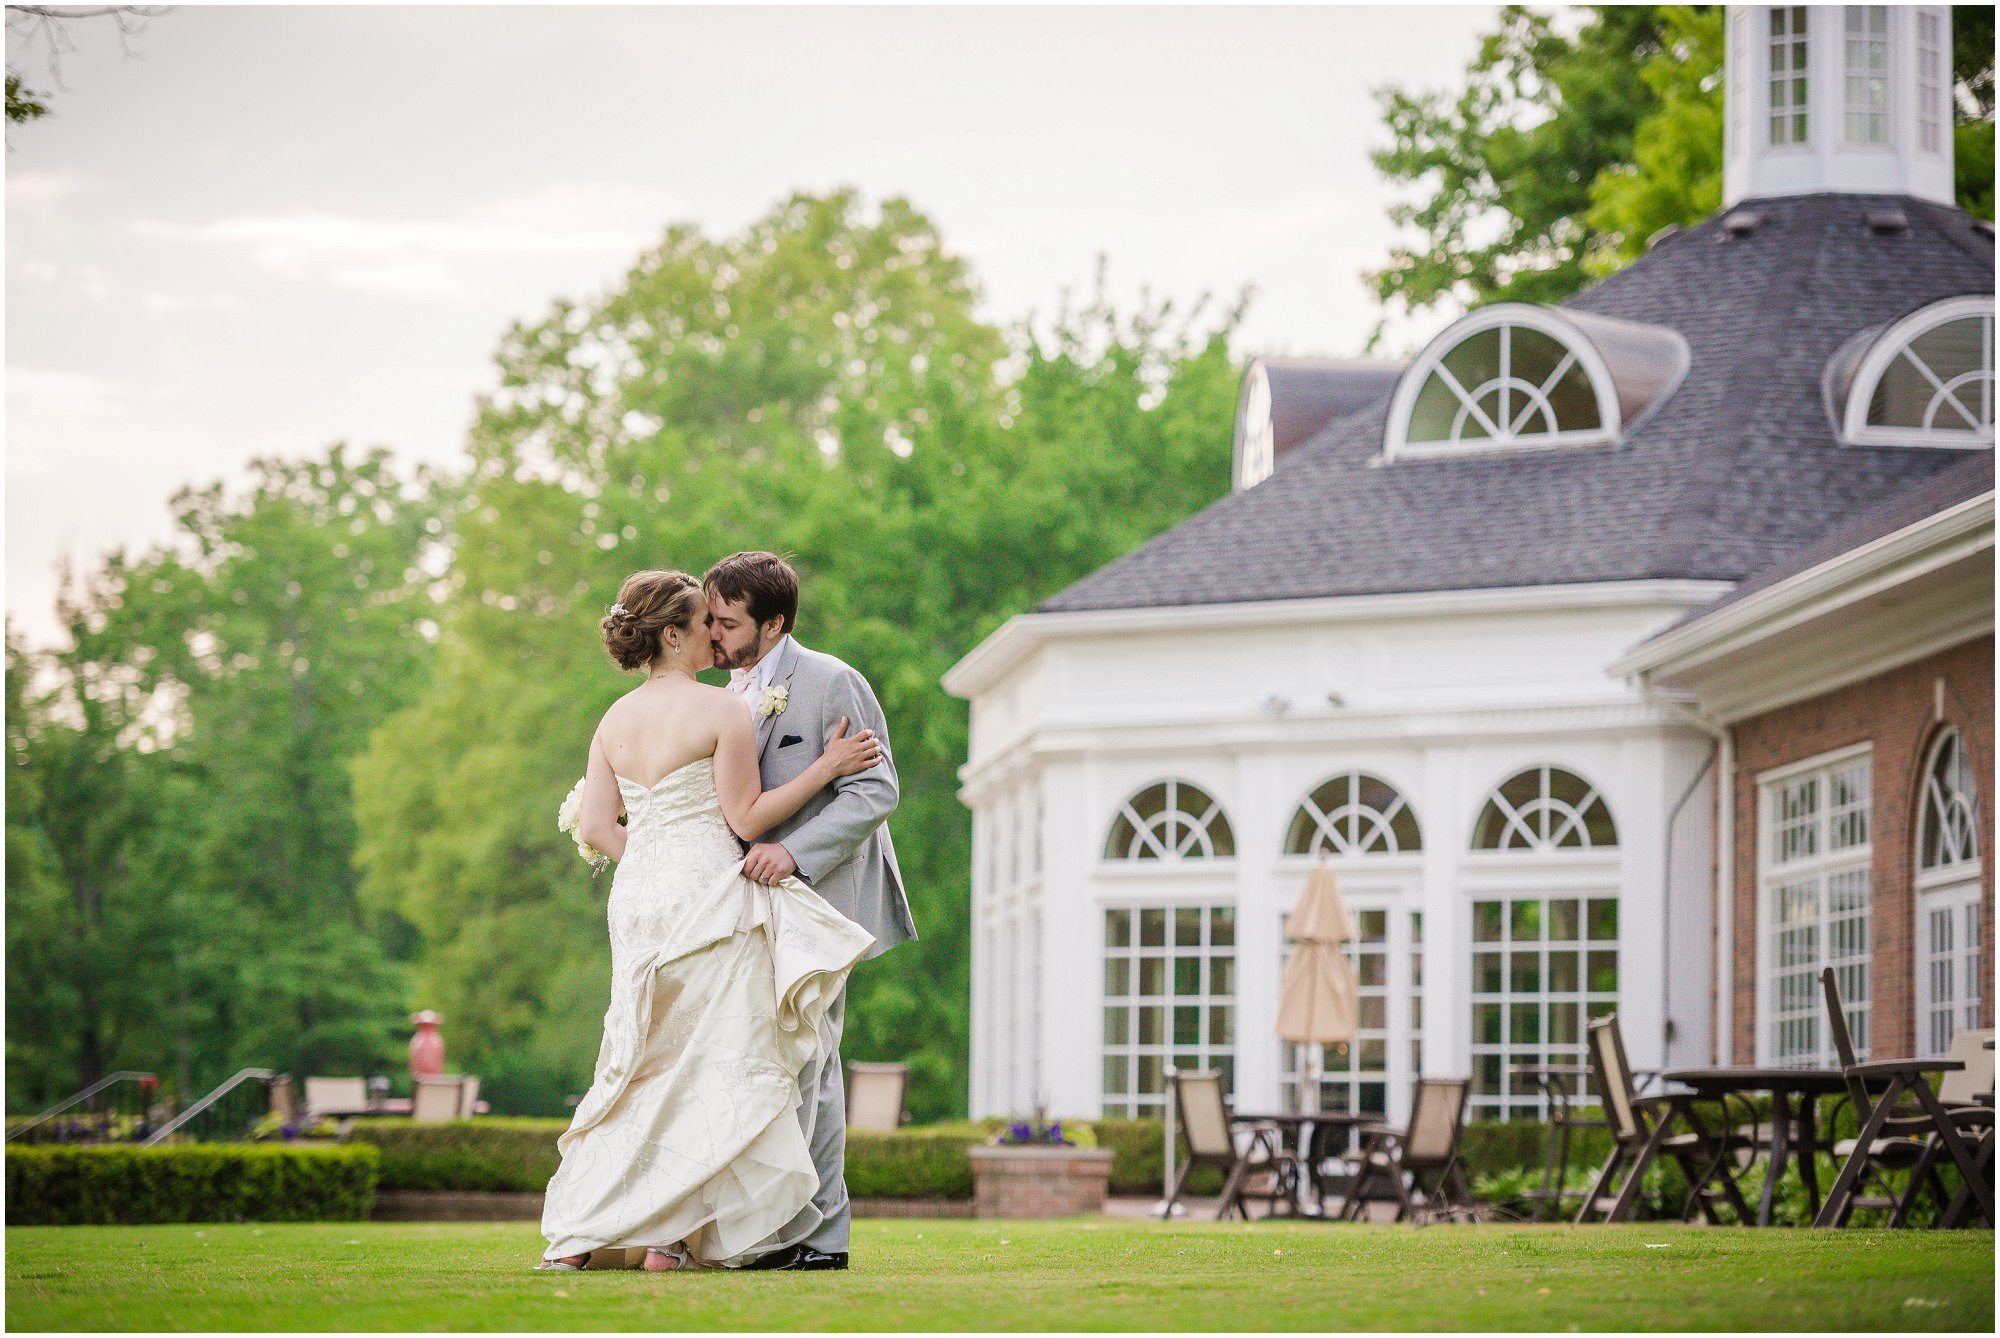 Cherry_Creek_Golf_Club_wedding_0479.jpg